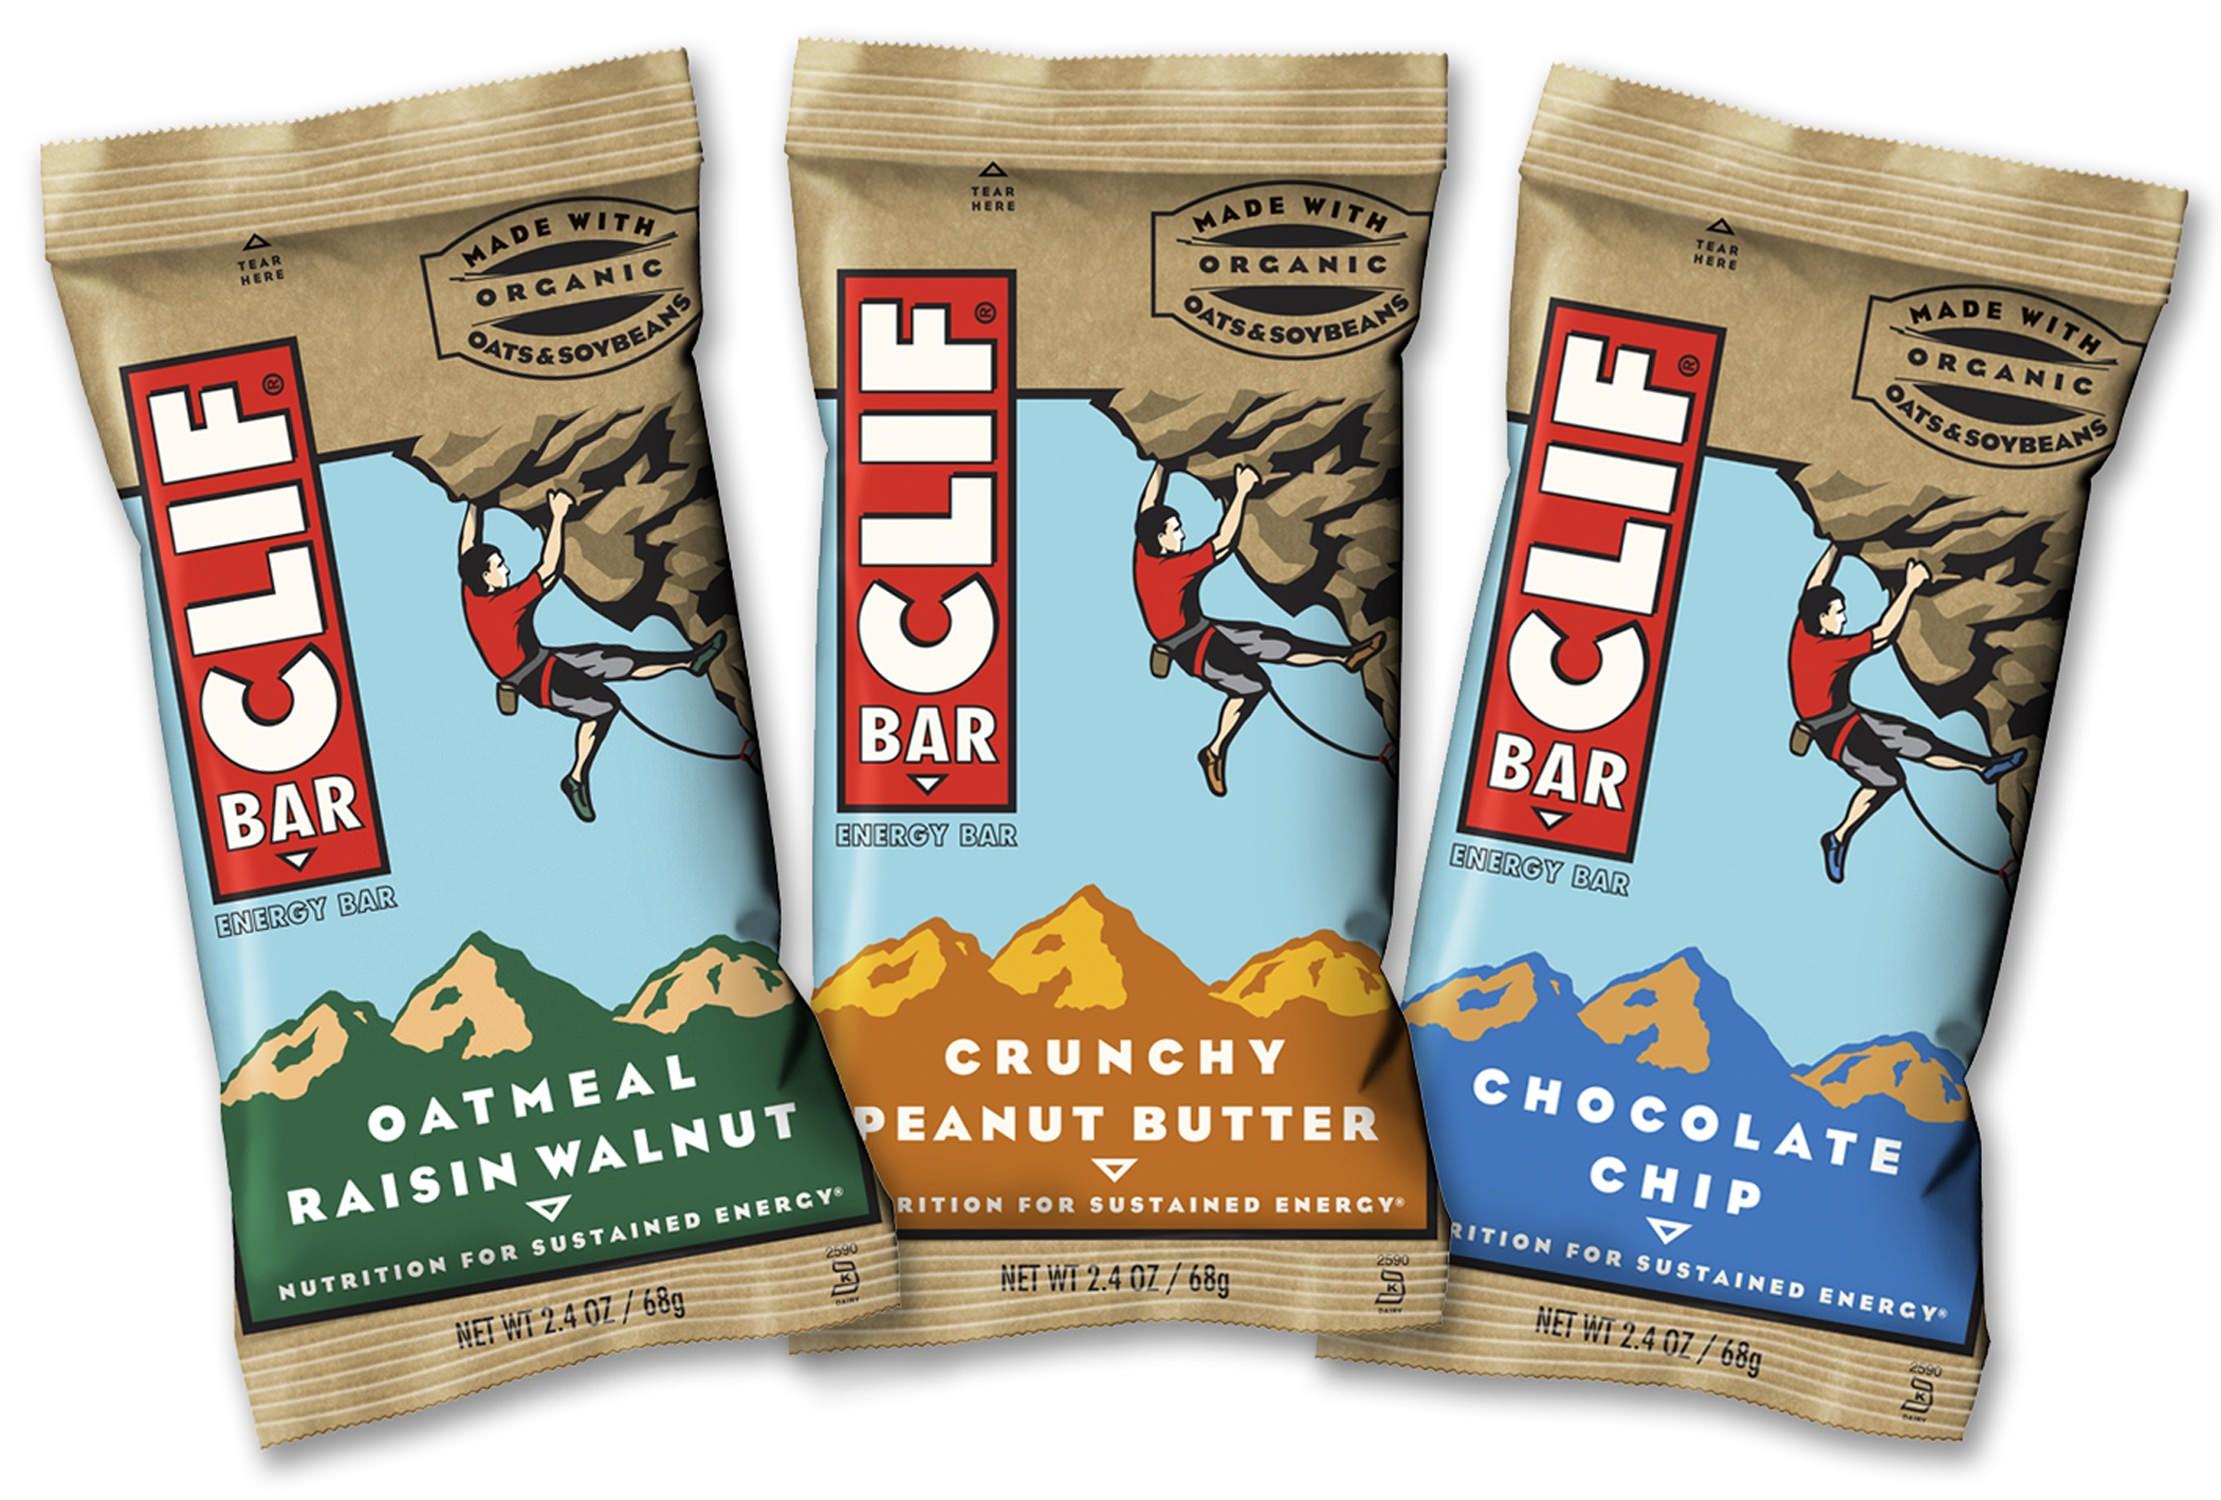 Cliff Bar